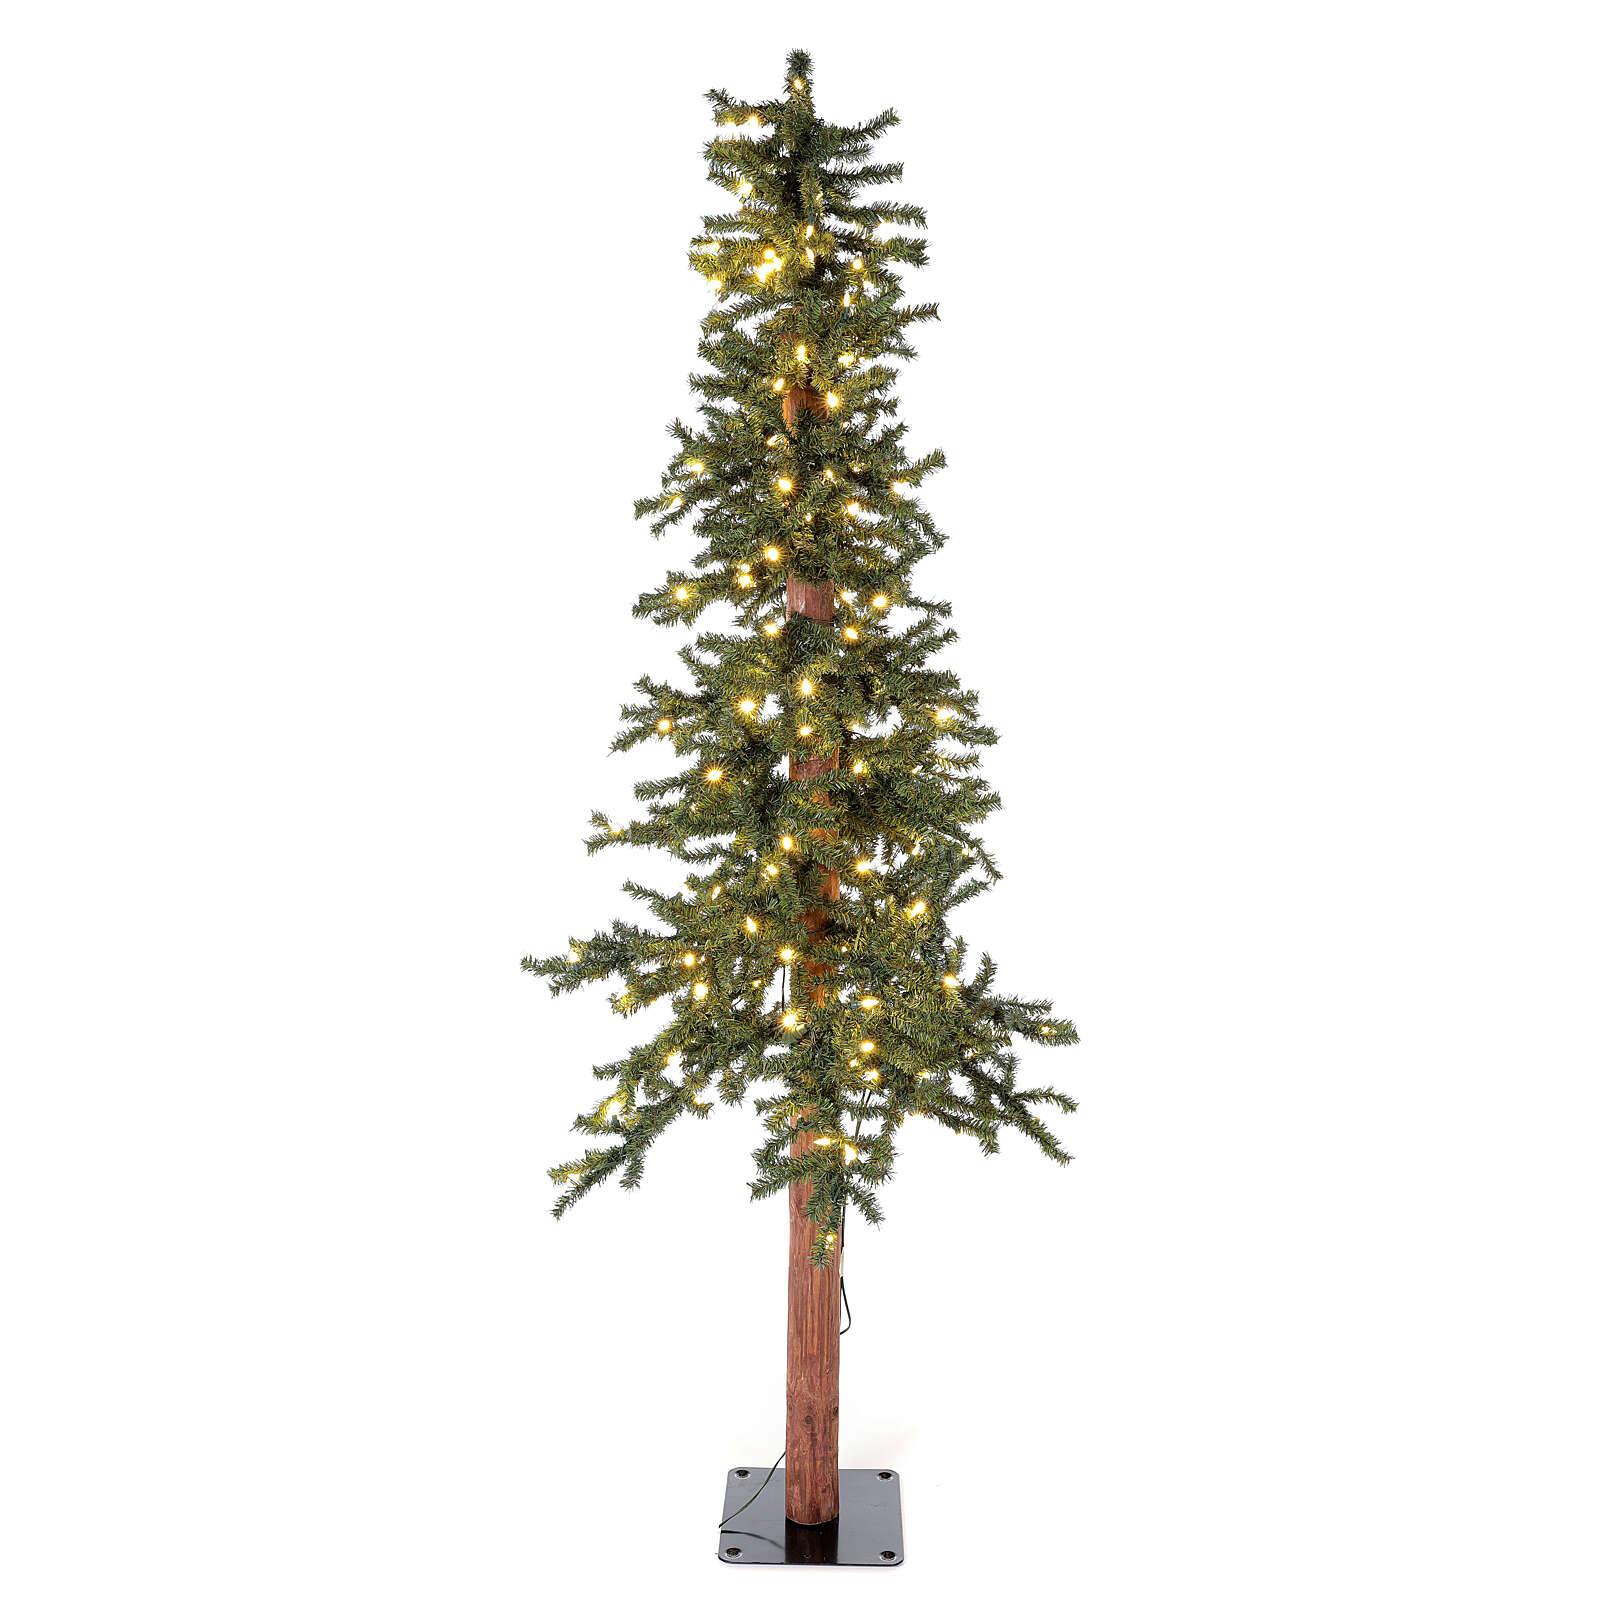 STOCK Albero Natale 180 cm Slim Forest 200 led bianco caldo esterno 3